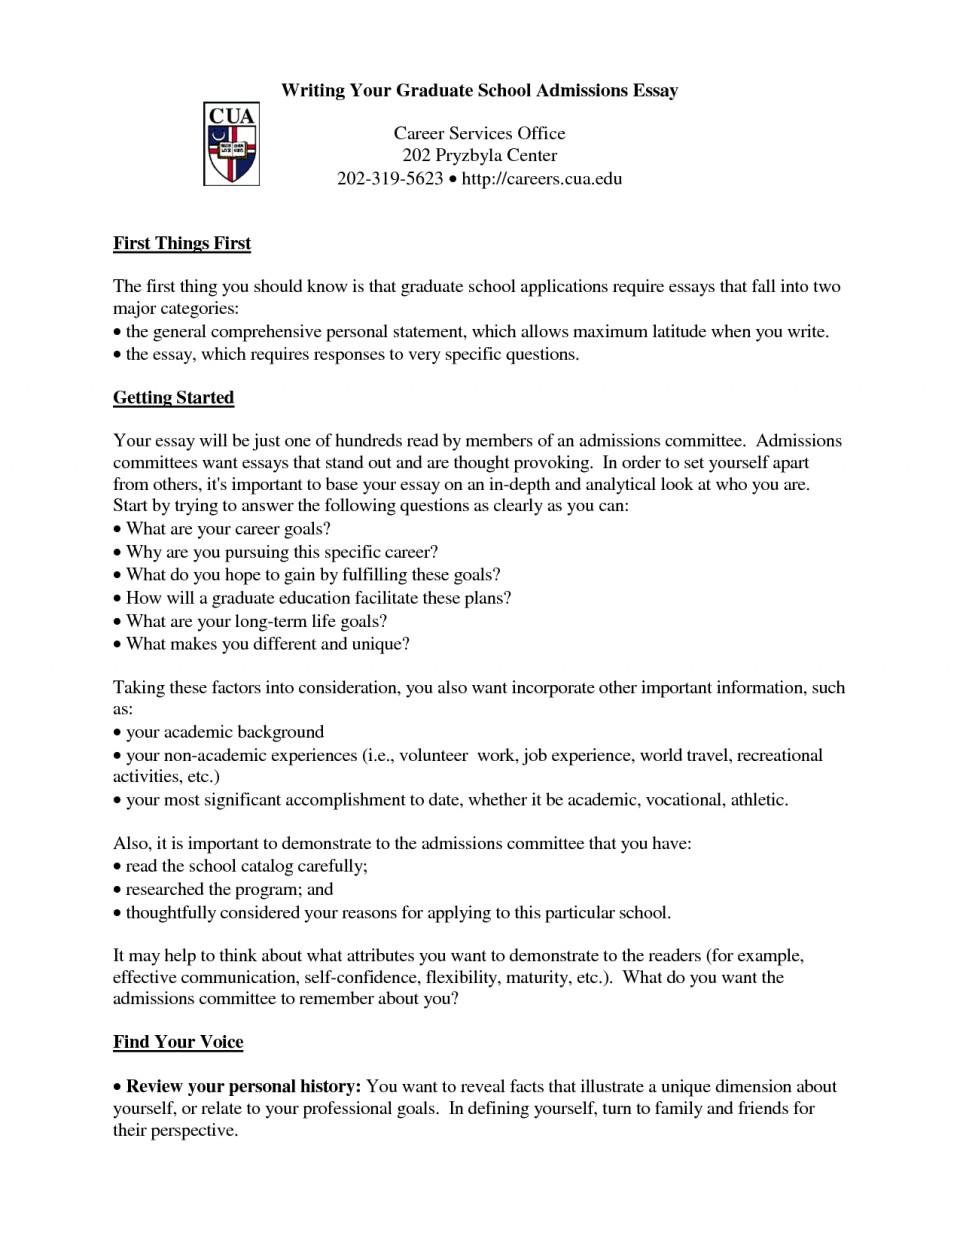 002 Essay Example Free Sample For Graduate School Admission Formidable Pdf 960